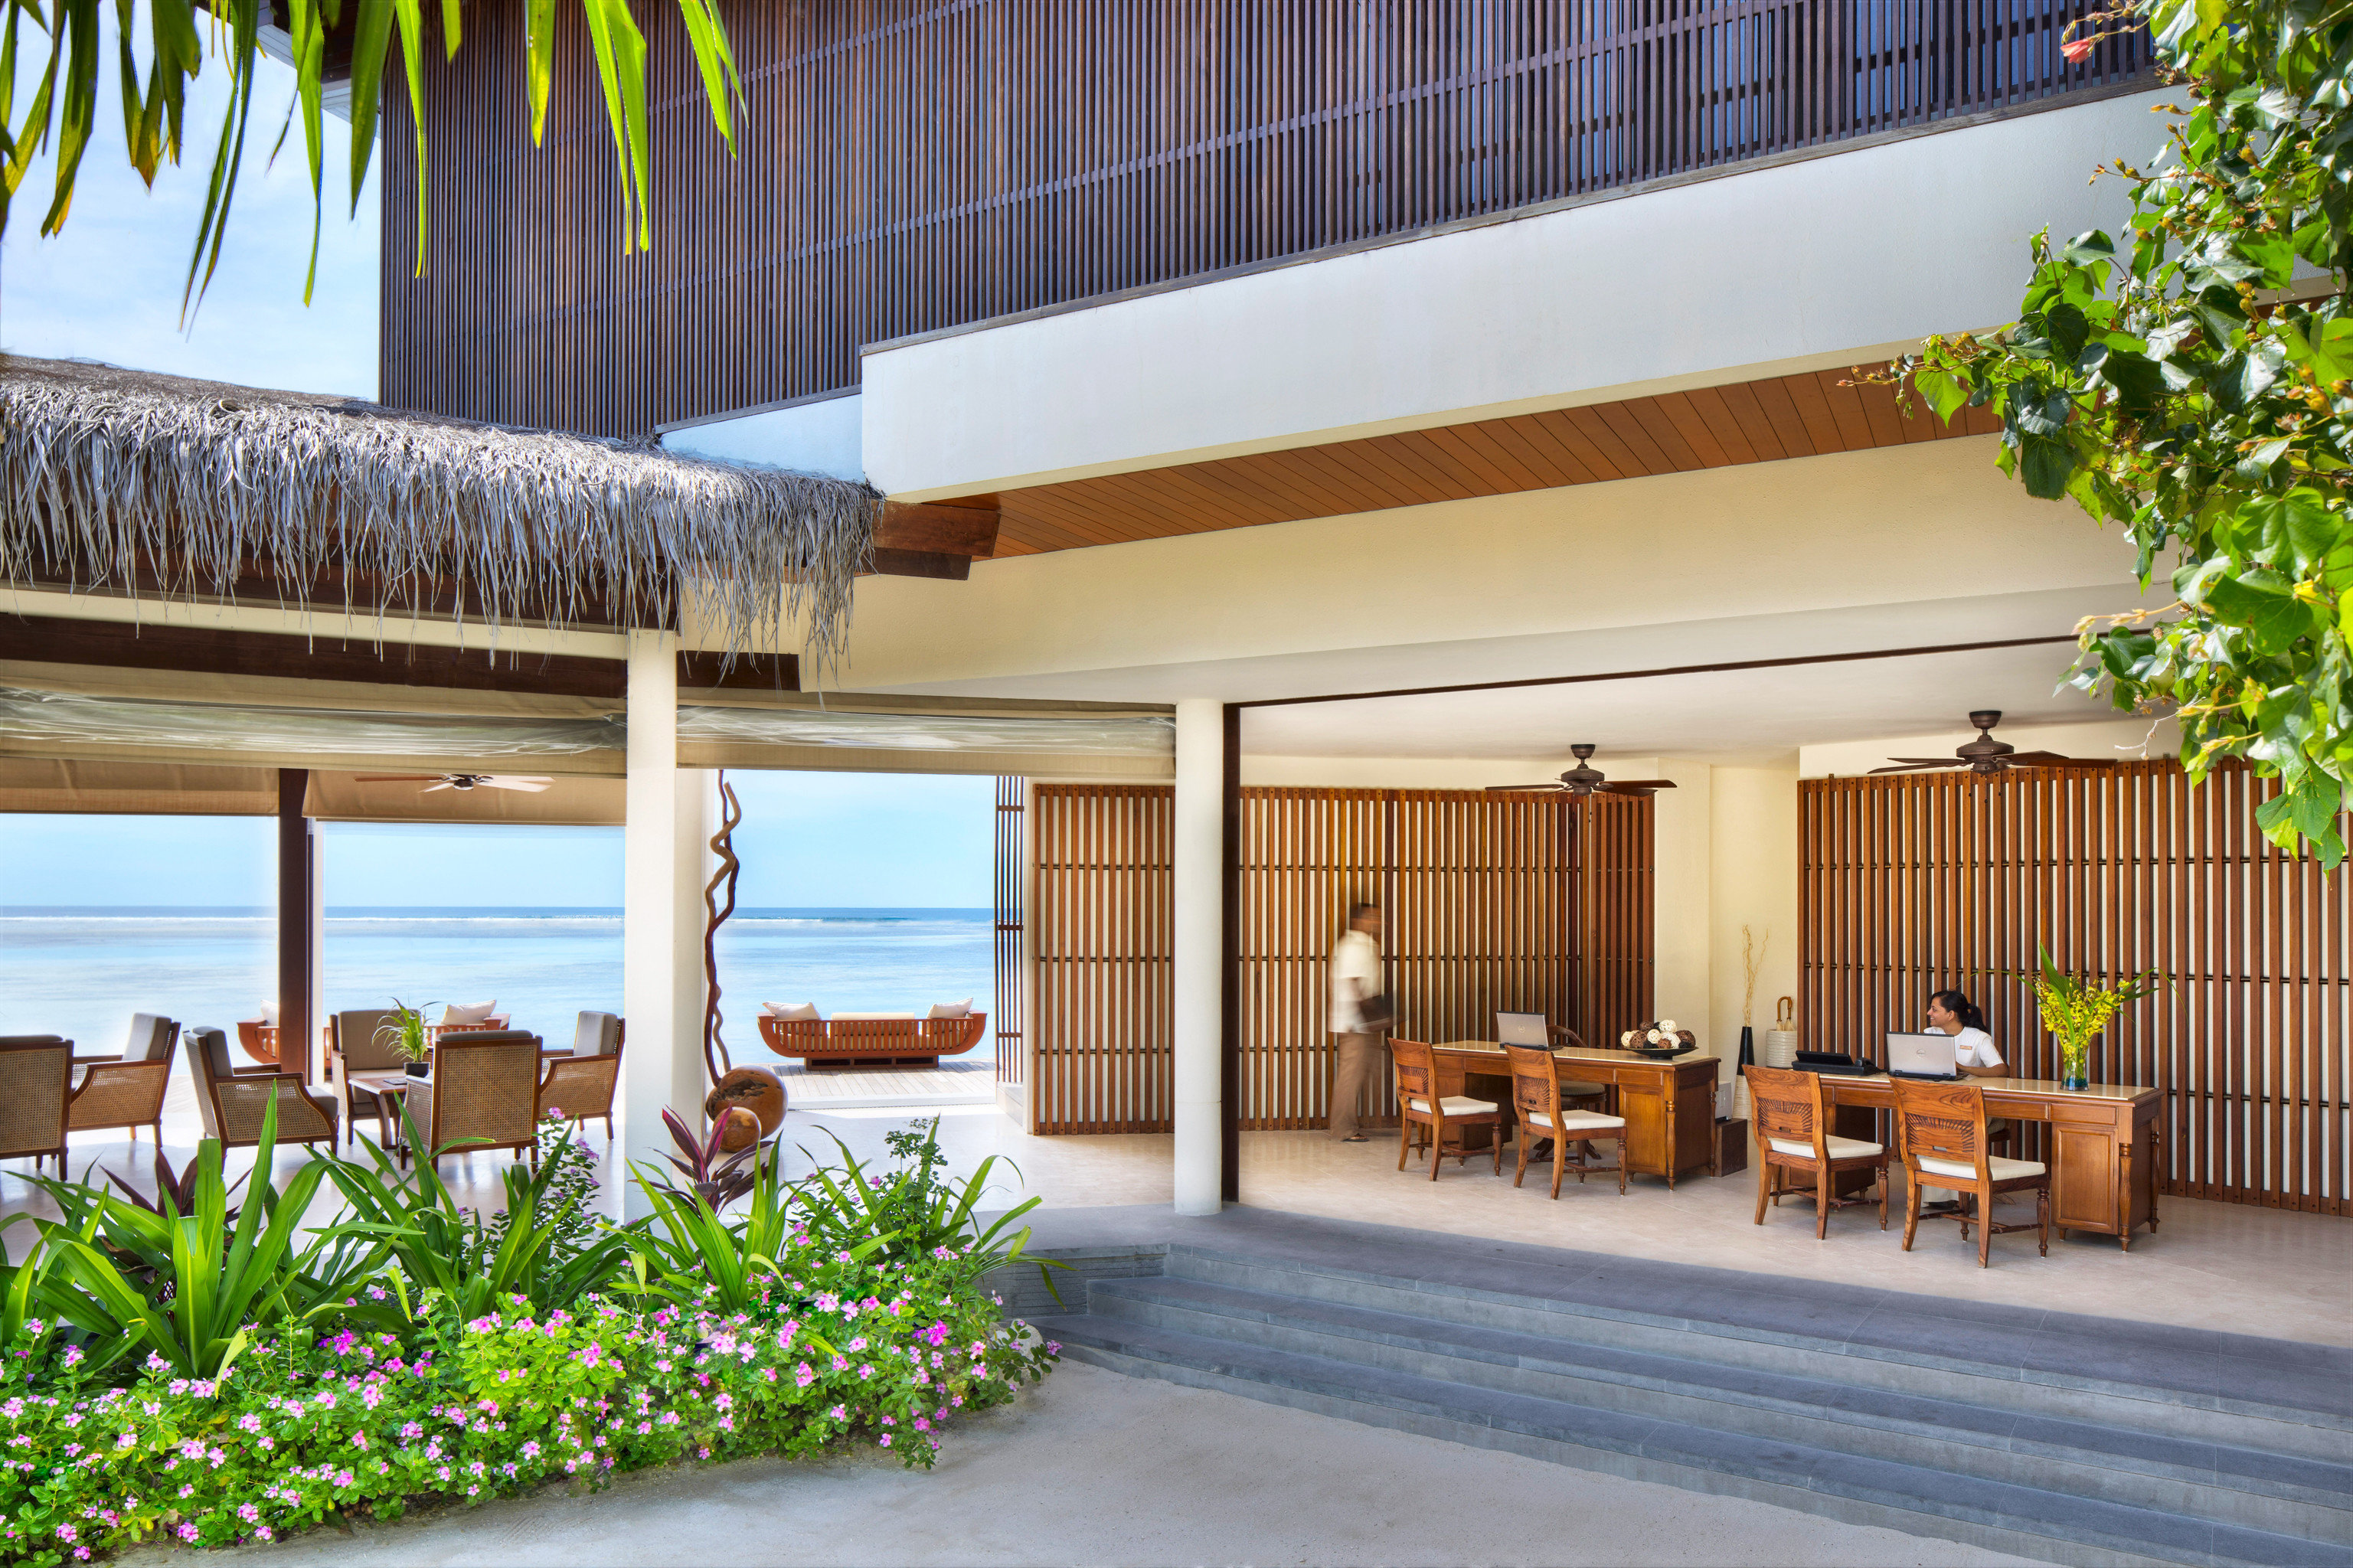 Beachfront Elegant Lobby Lounge Luxury property house home condominium plant Architecture Courtyard Resort residential area Villa professional mansion porch stone